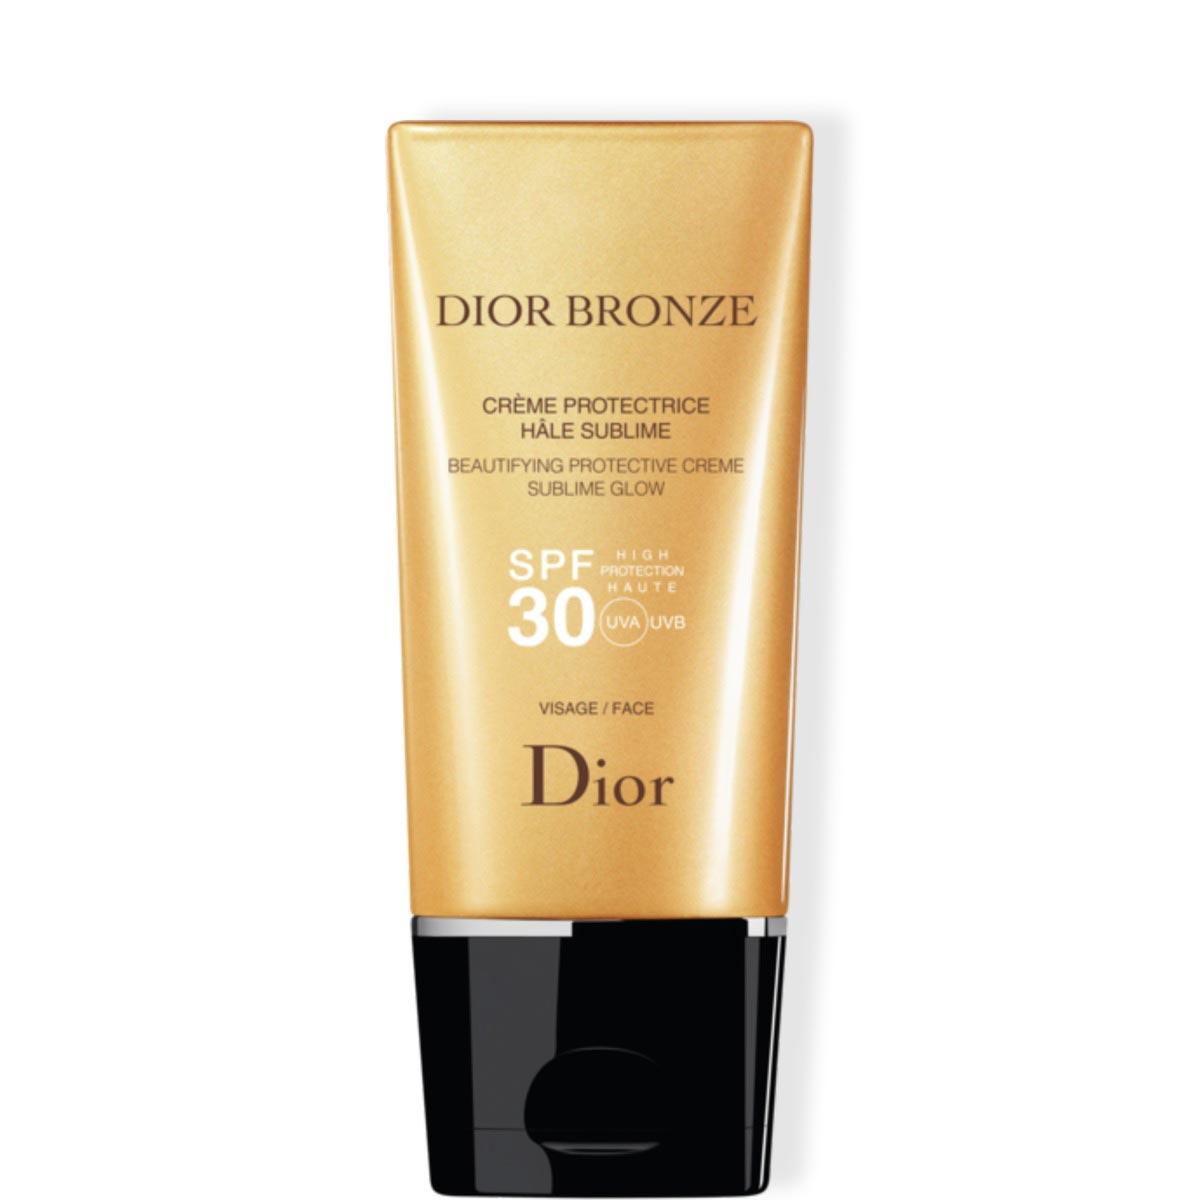 Dior - Dior Bronze - Crème Protectrice Hâle Sublime SPF 30